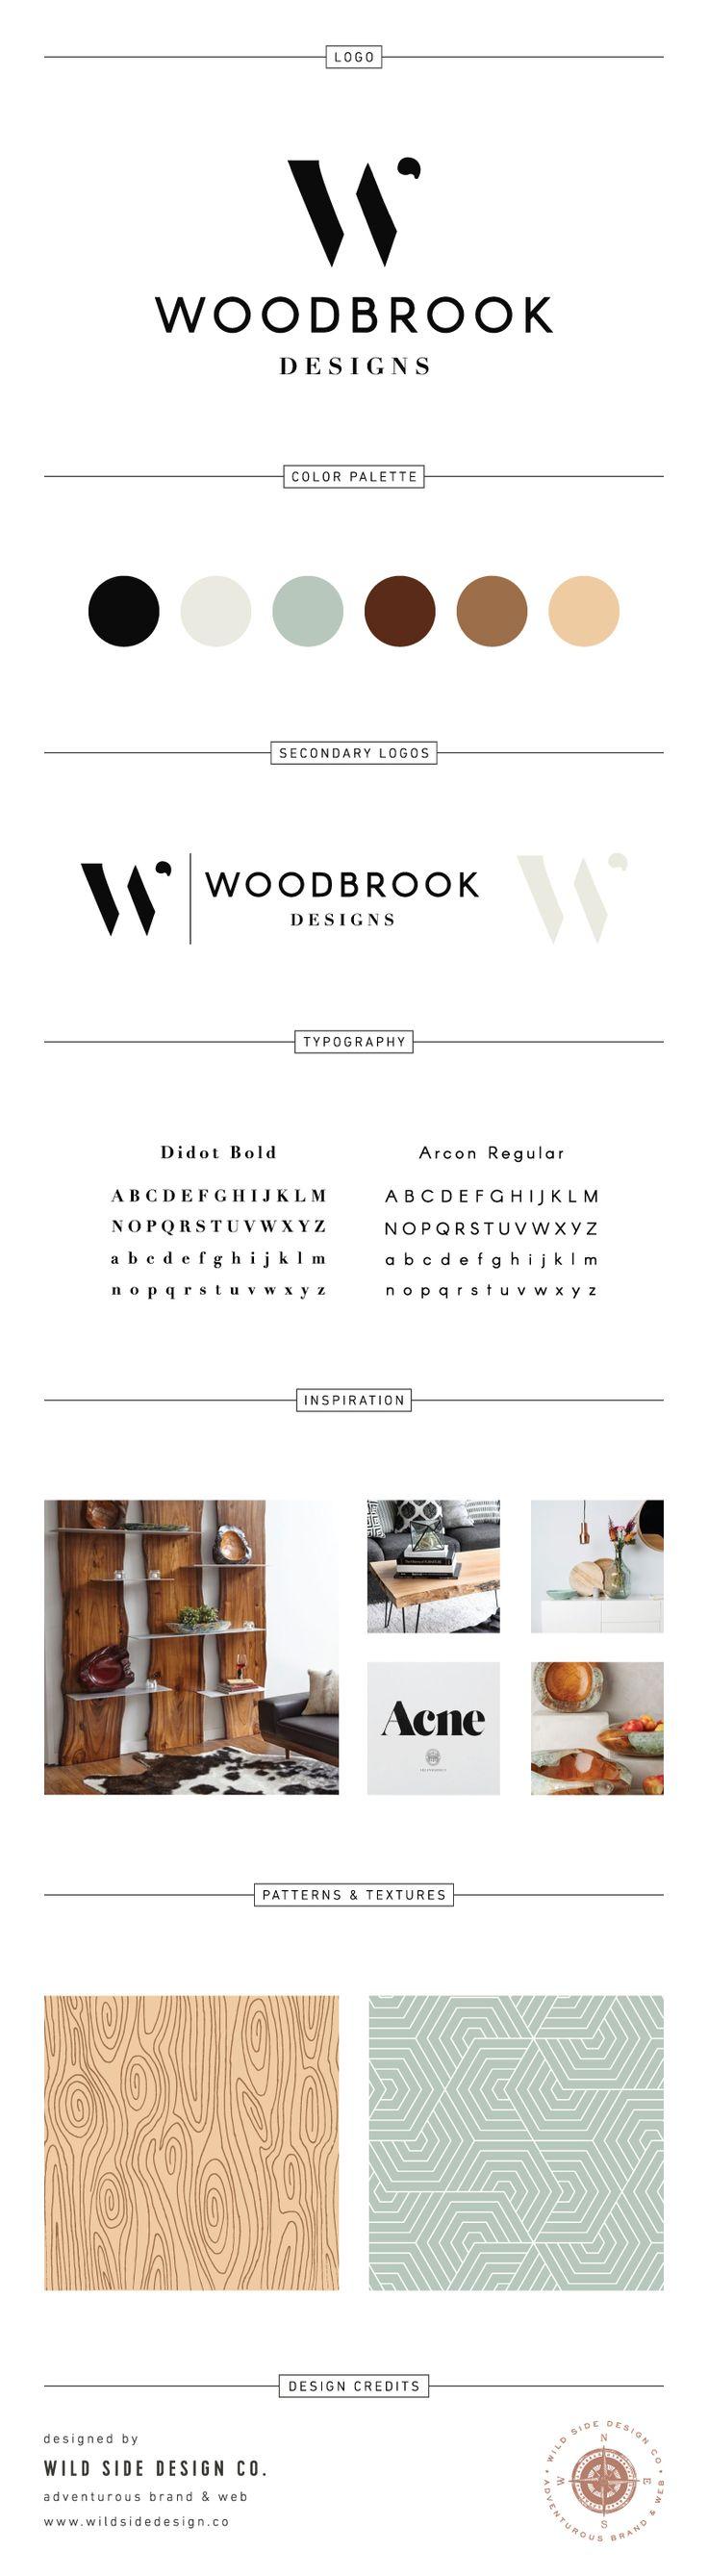 Brand Launch :: Brand Style Board :: Contemporary Interior Decor Branding :: Woodbrook Designs Brand Design :: #branding www.wildsidedesign.co